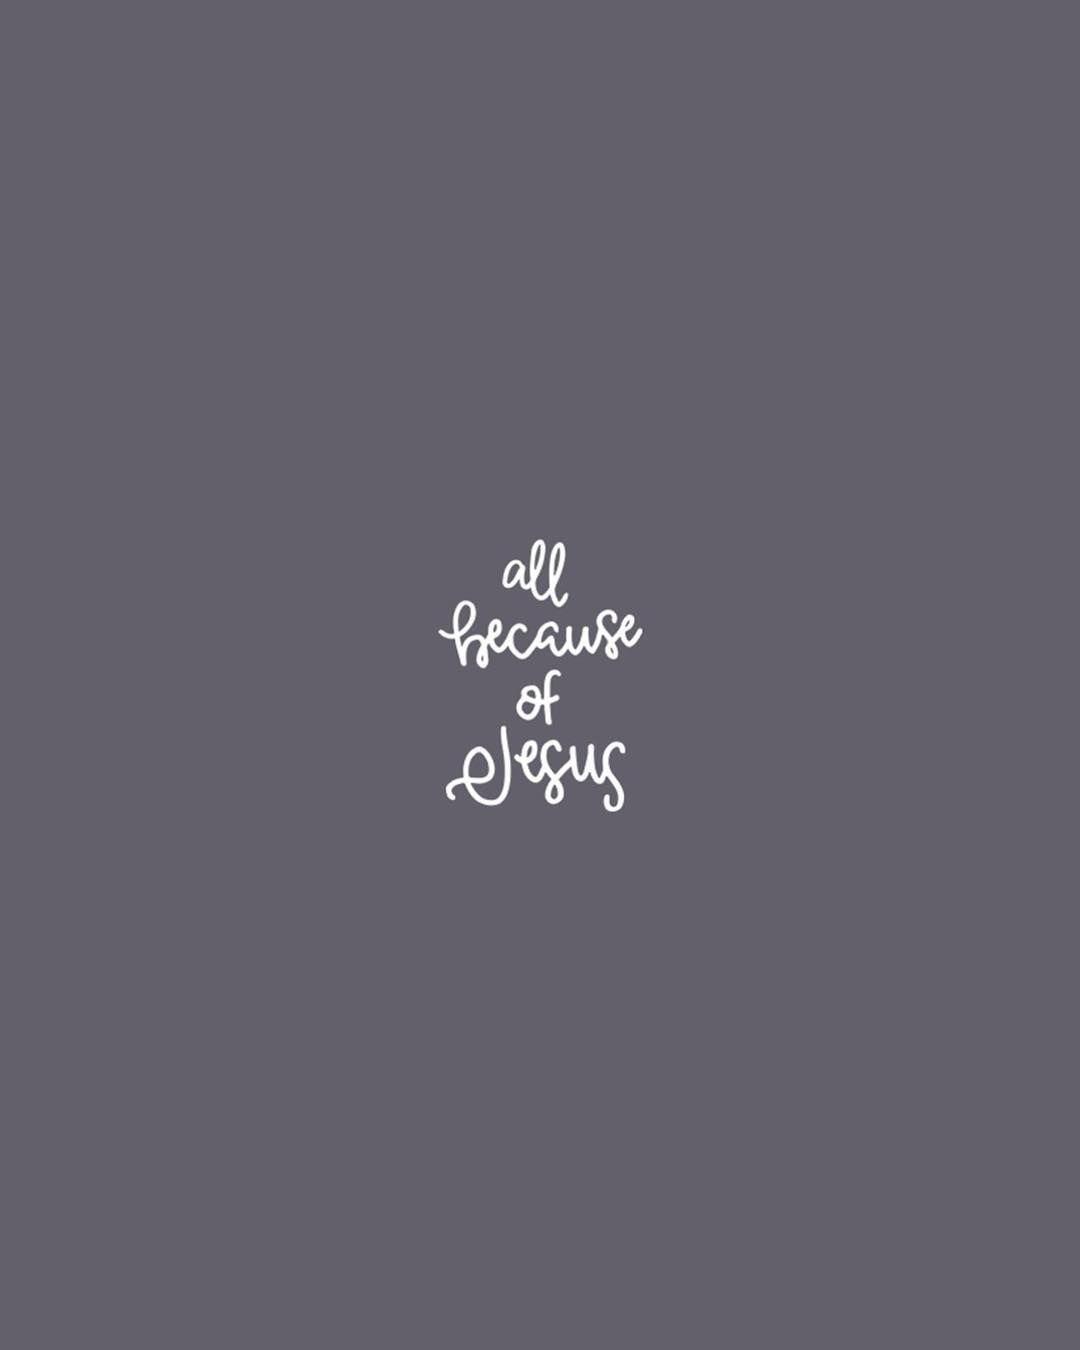 All Because Of Jesus  Design by @joyfulpine | Follow